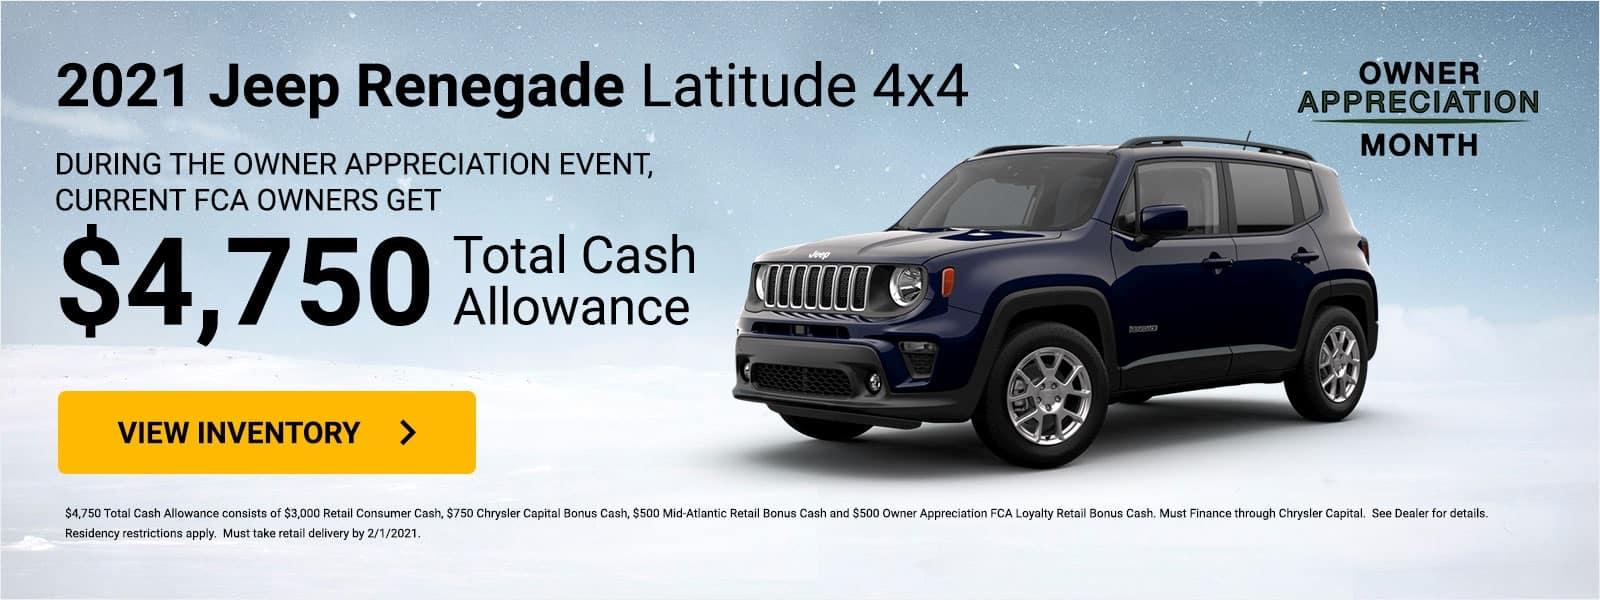 jeep-renegade-latitude-4×4 RETAIL (All Markets)